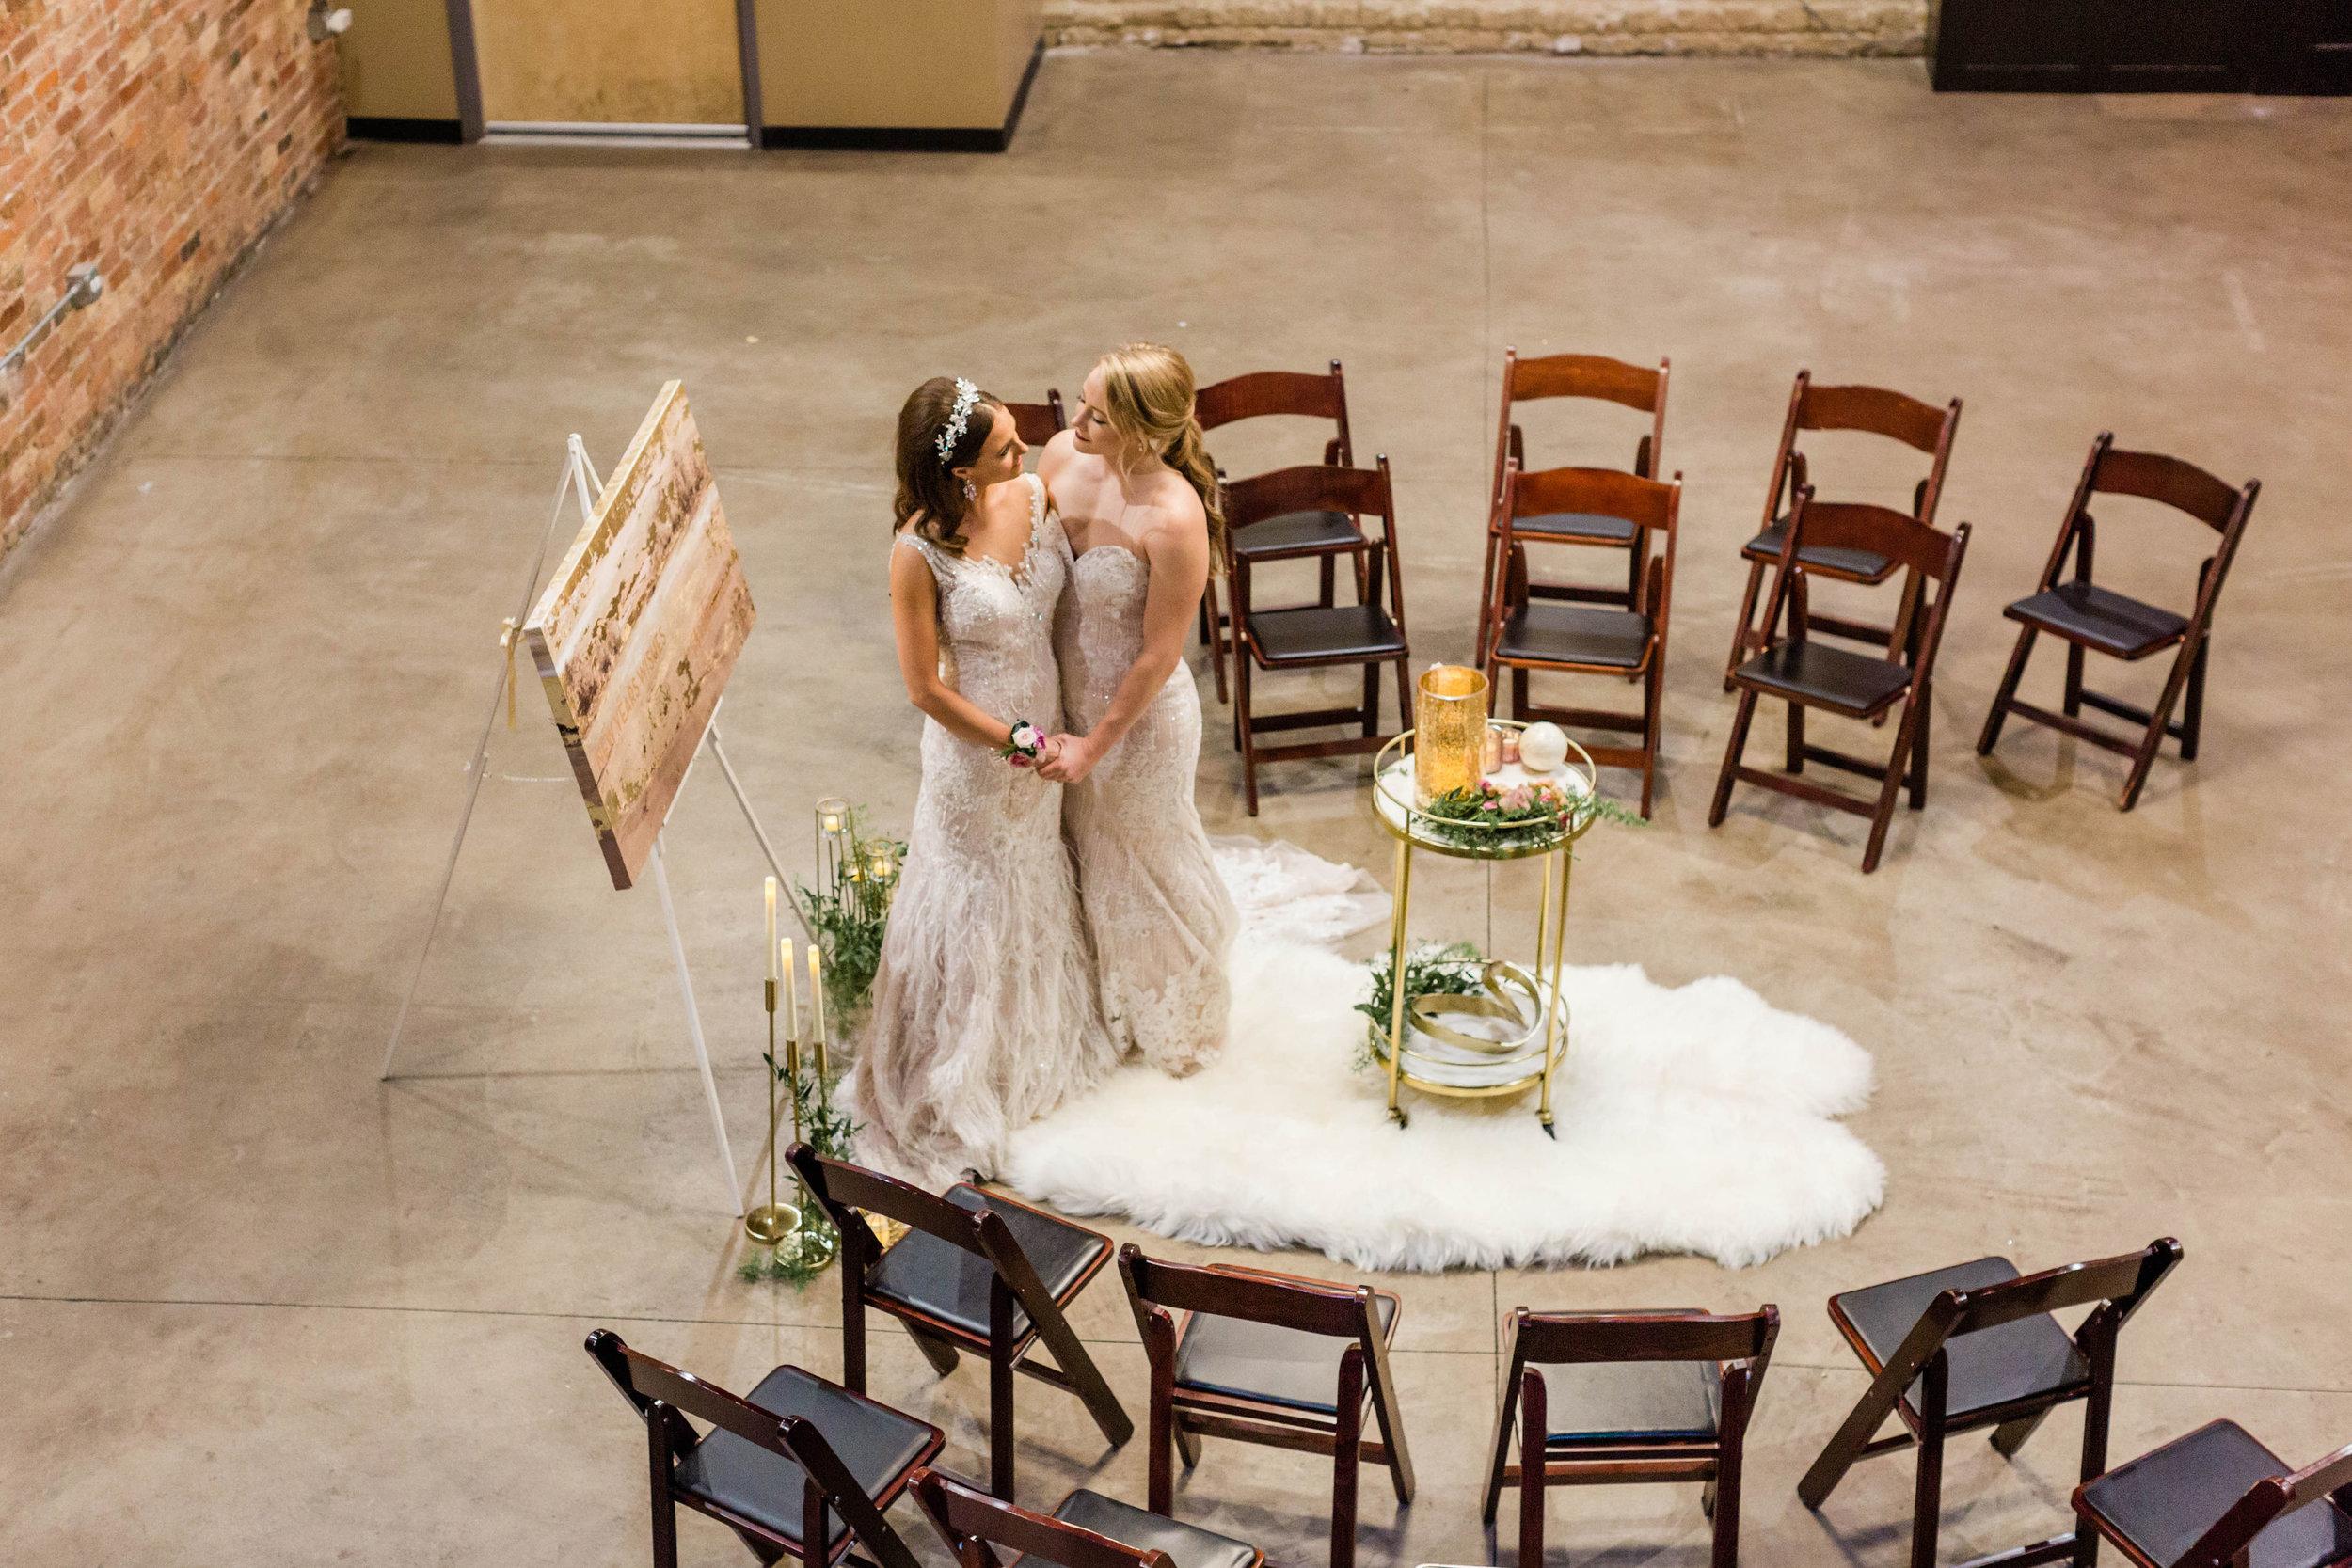 Intimate LGBTQ Chicago Wedding Photography by Lauryn